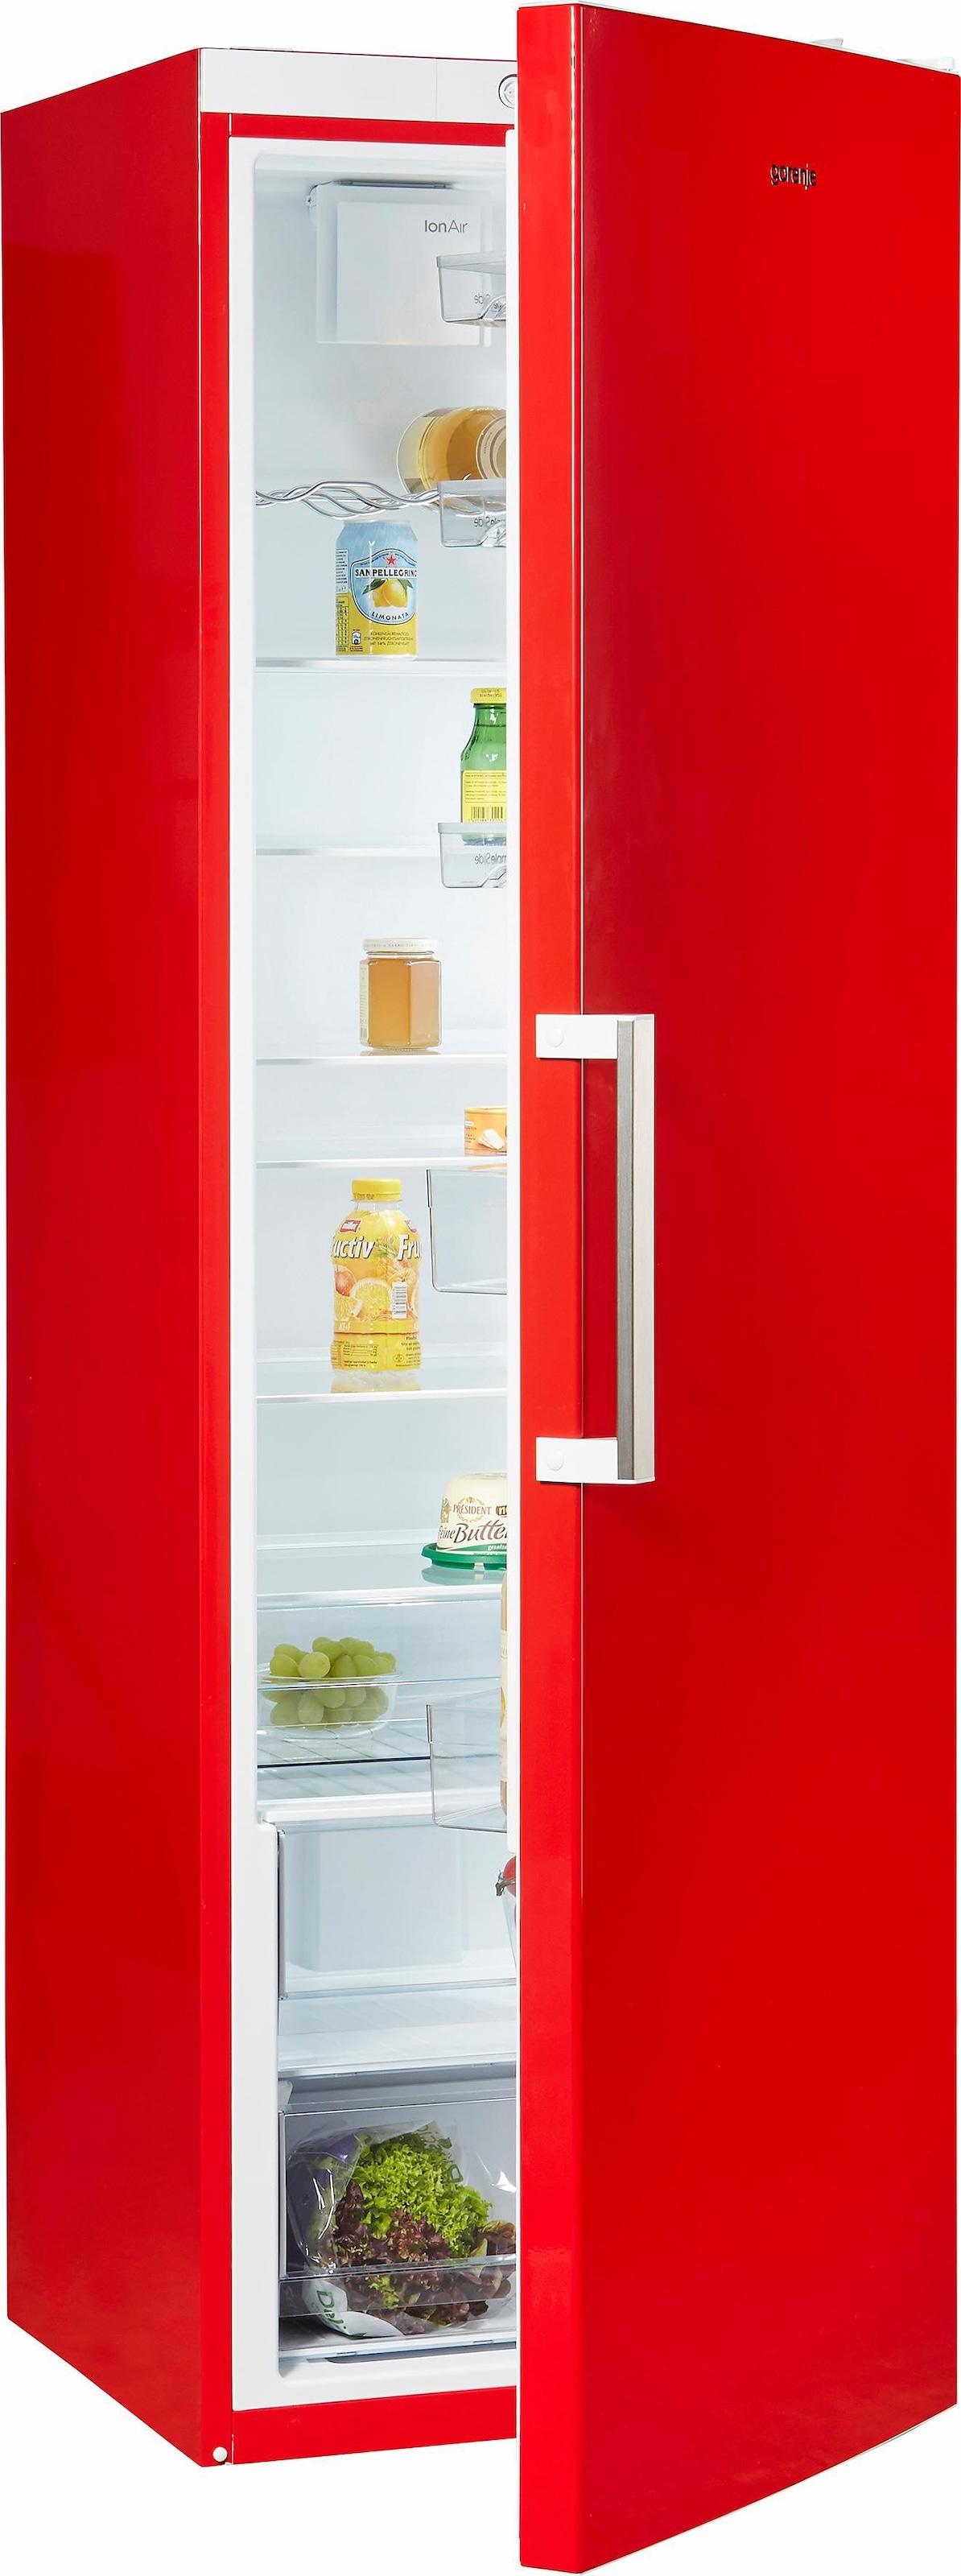 Gorenje Kühlschrank Crispzone : Gorenje retro kühlschränke als fußball spezial elektrojournal